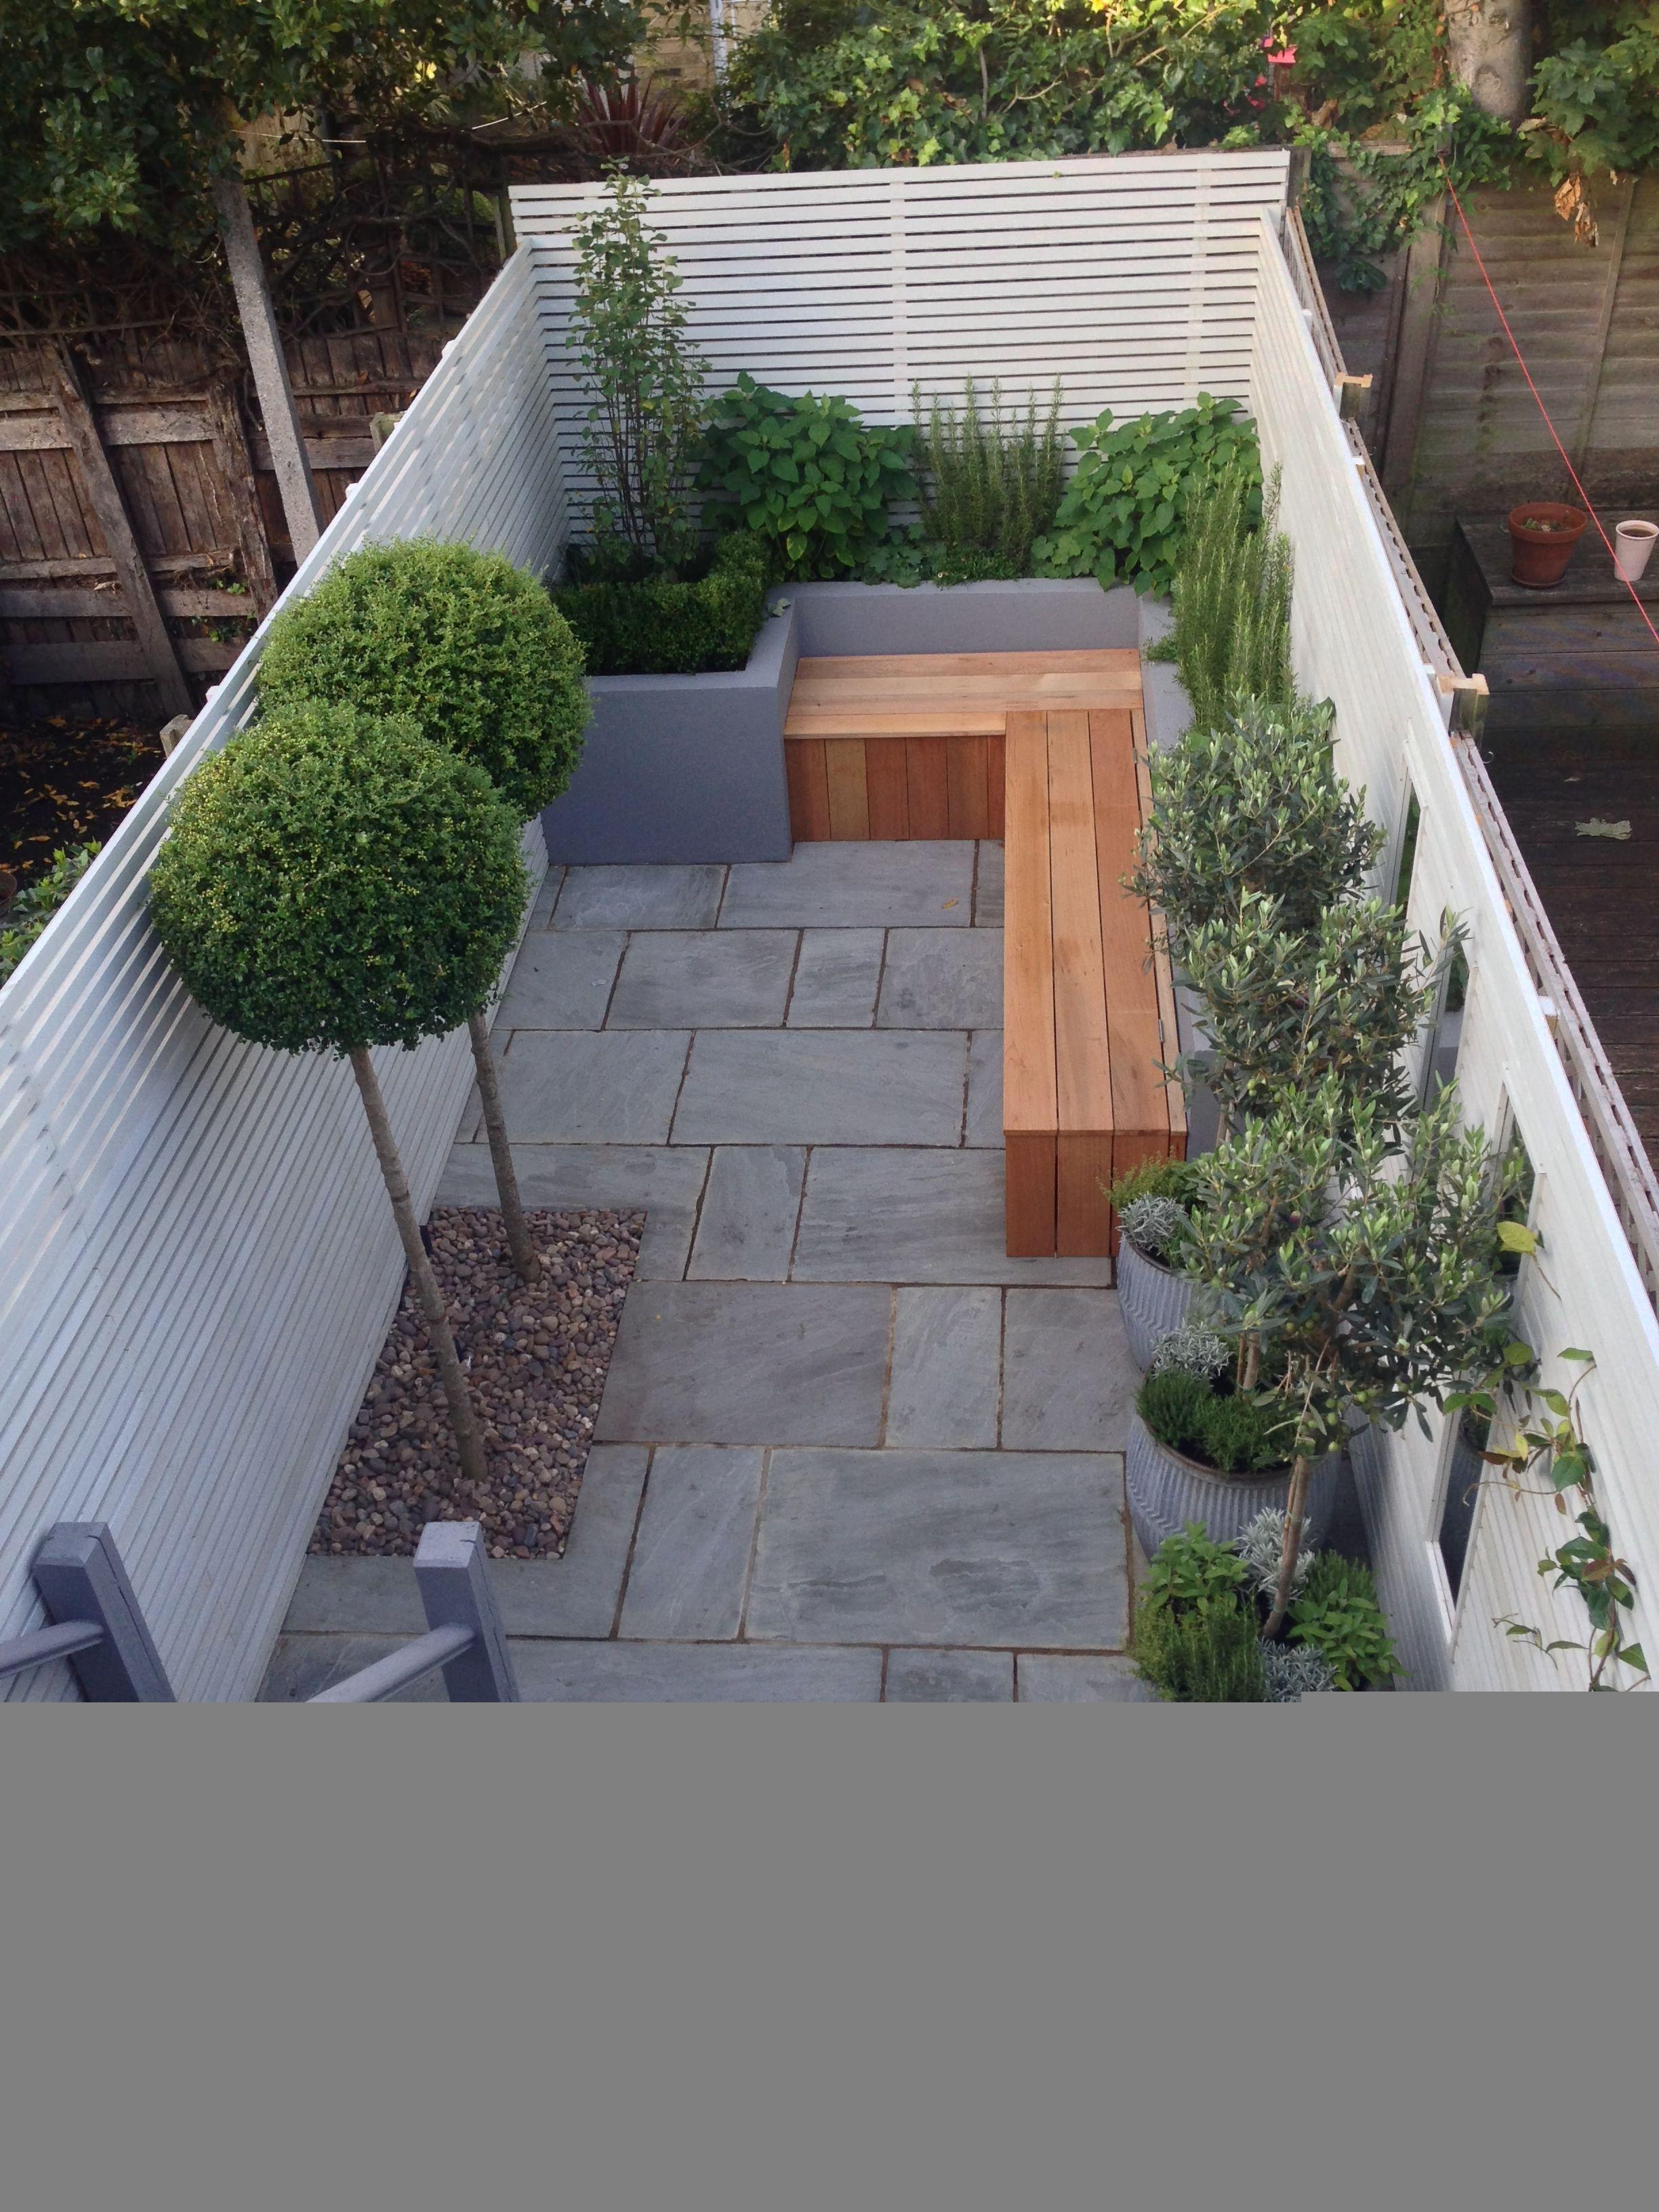 Balcony Design London: Patio, Porch & Balcony